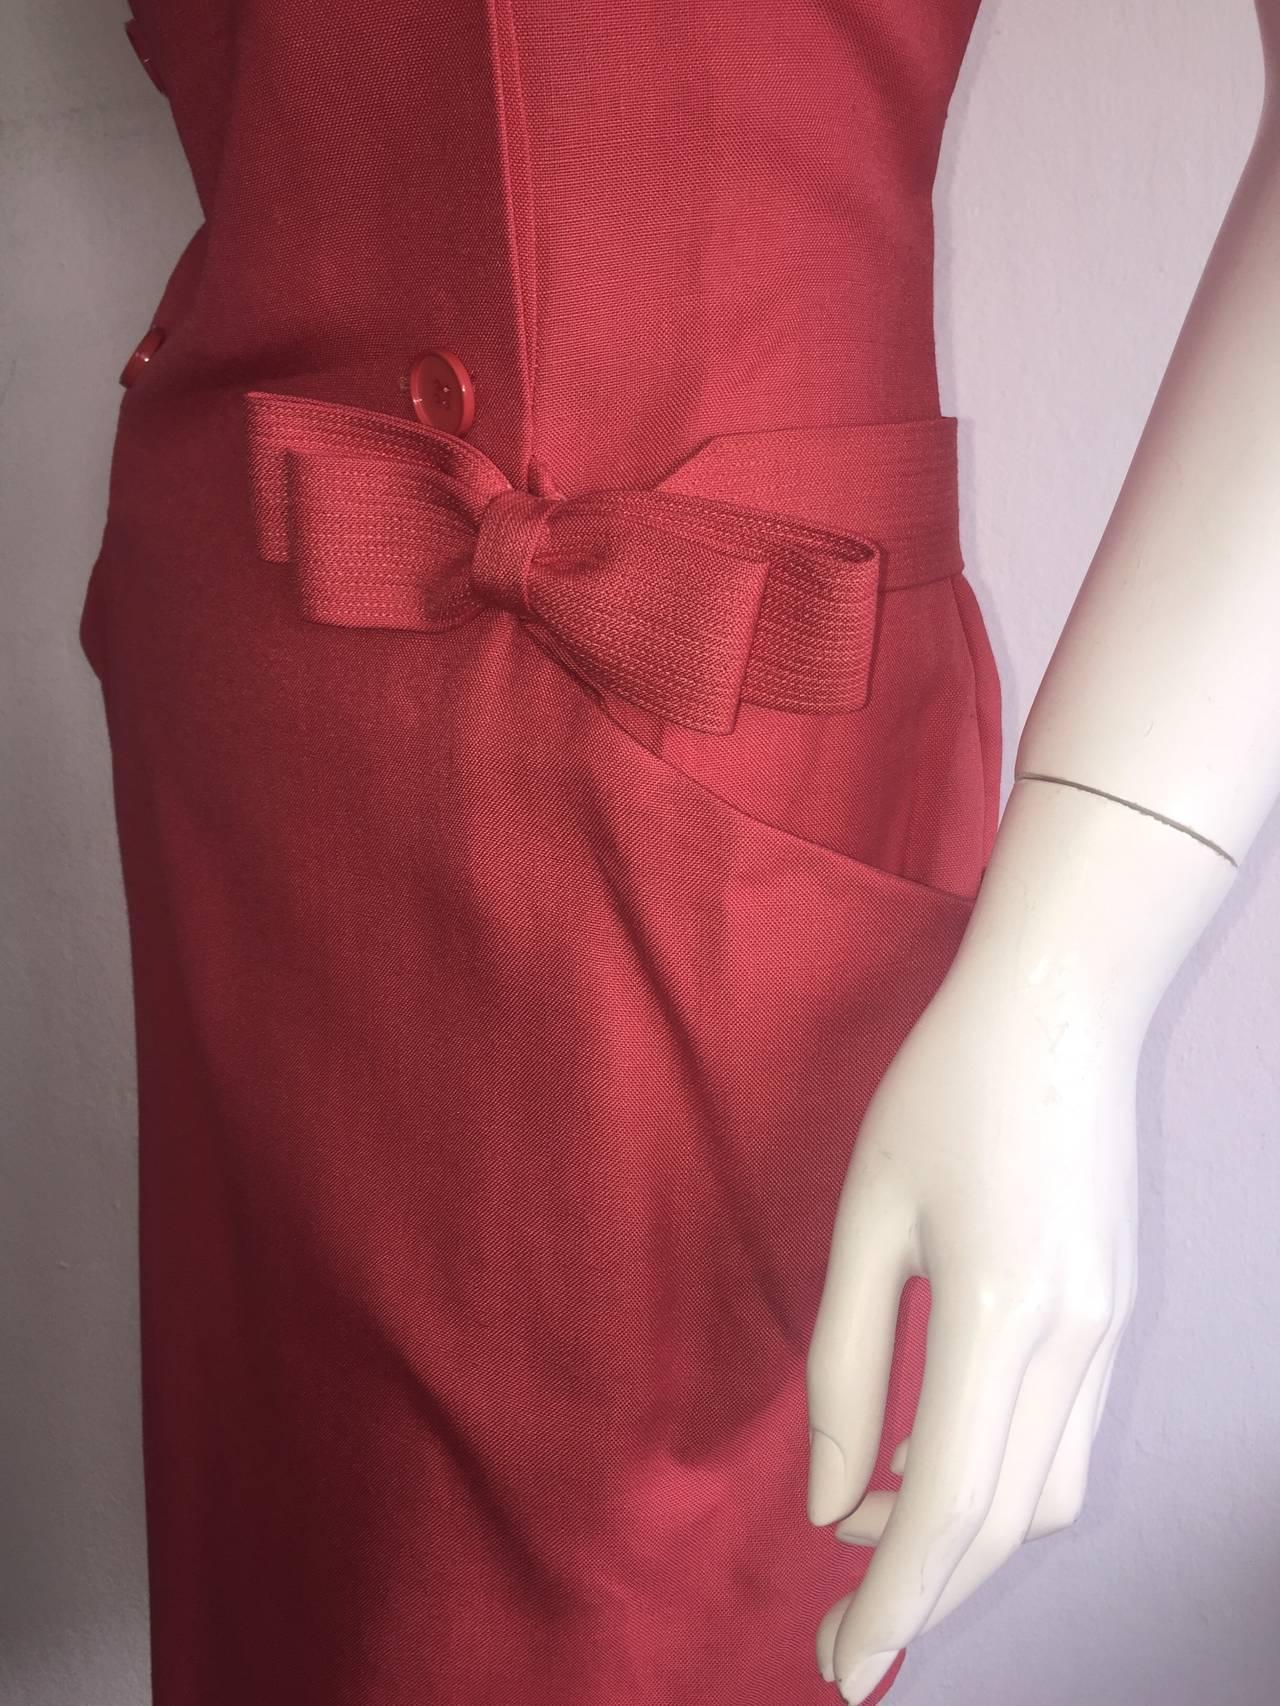 Vintage Nina Ricci Raspberry Pink Double Breasted Dress w/ Pockets + Bow Belt 4